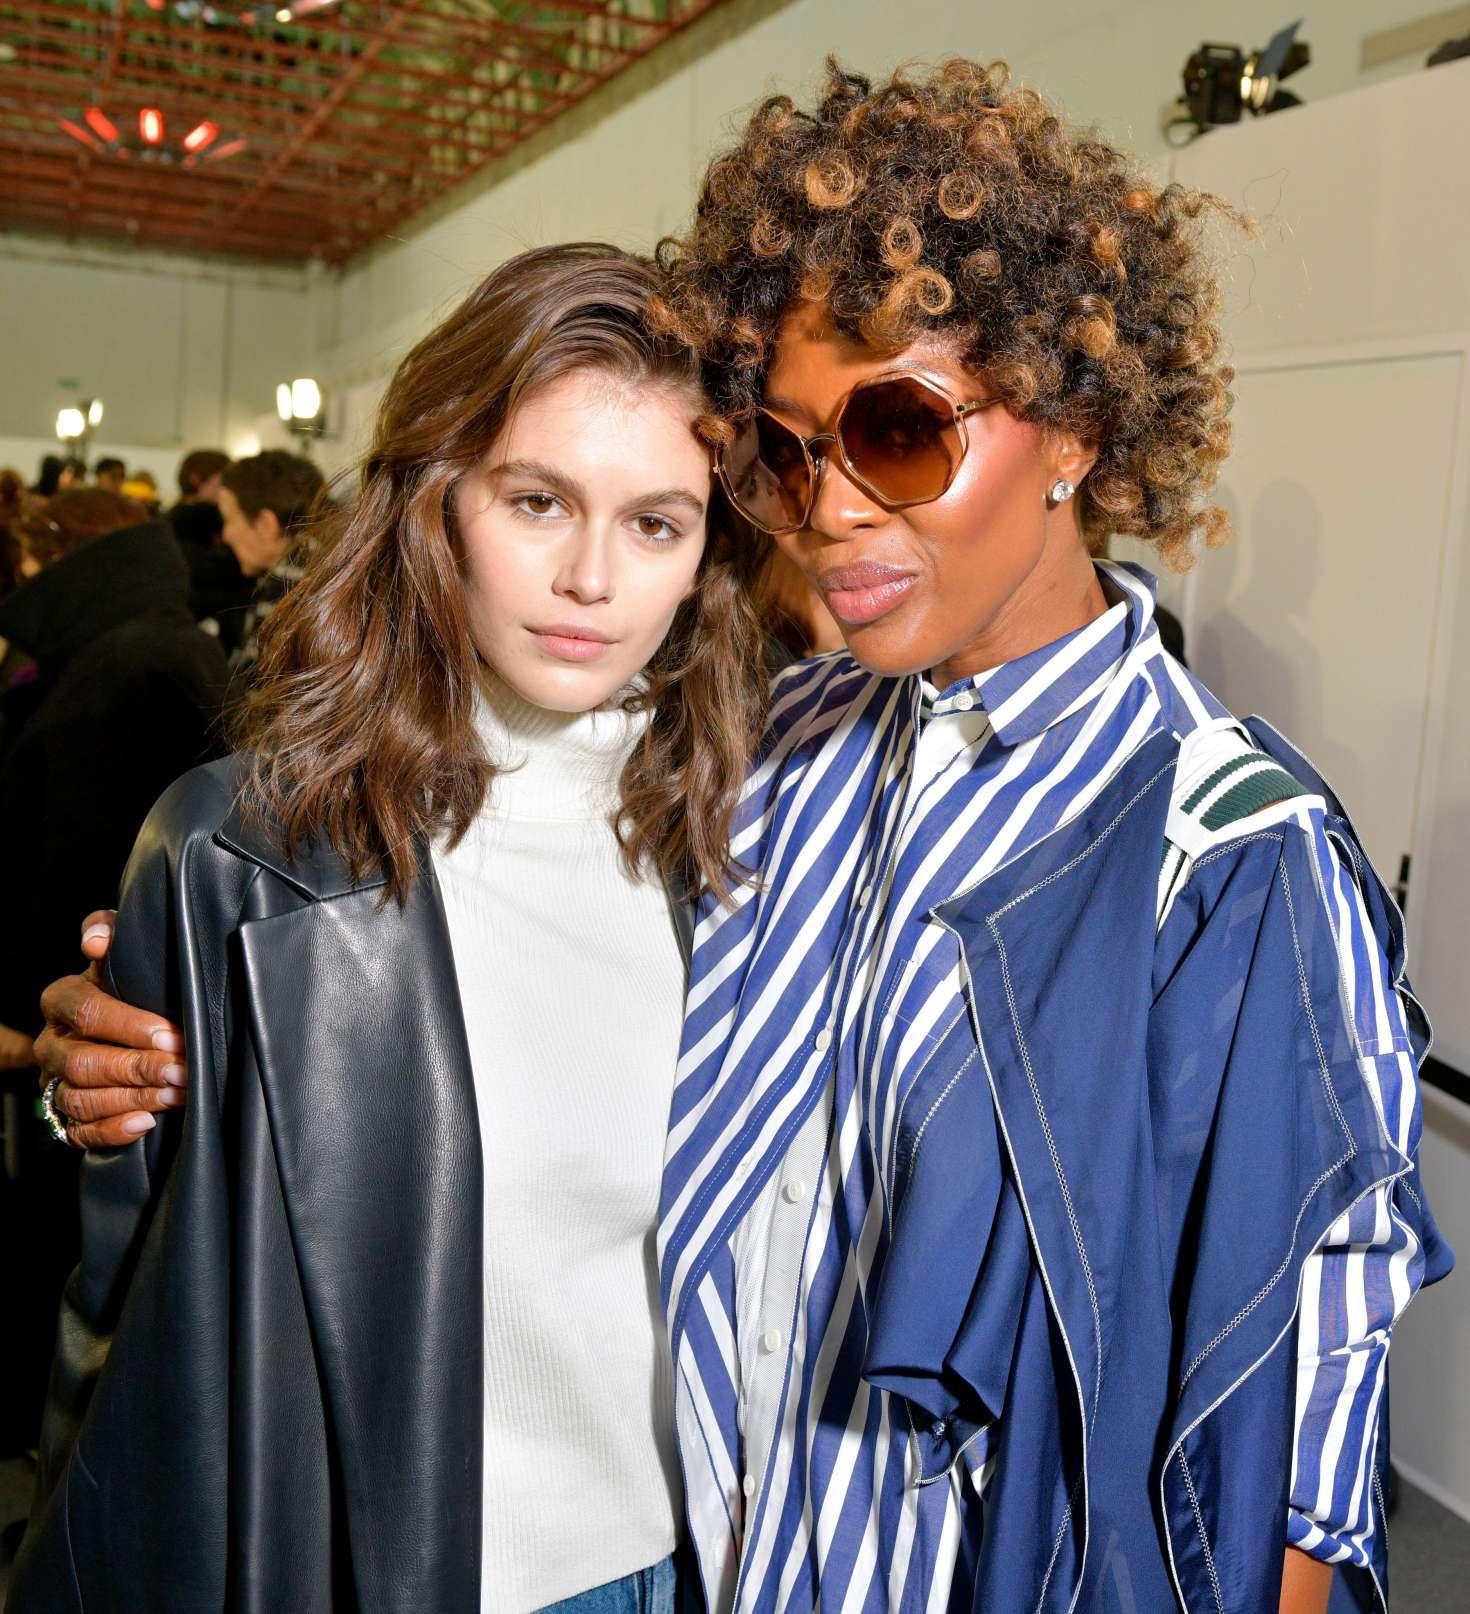 Kaia Gerber and Naomi Campbell - Backstage Sacai Fashion Show in Paris